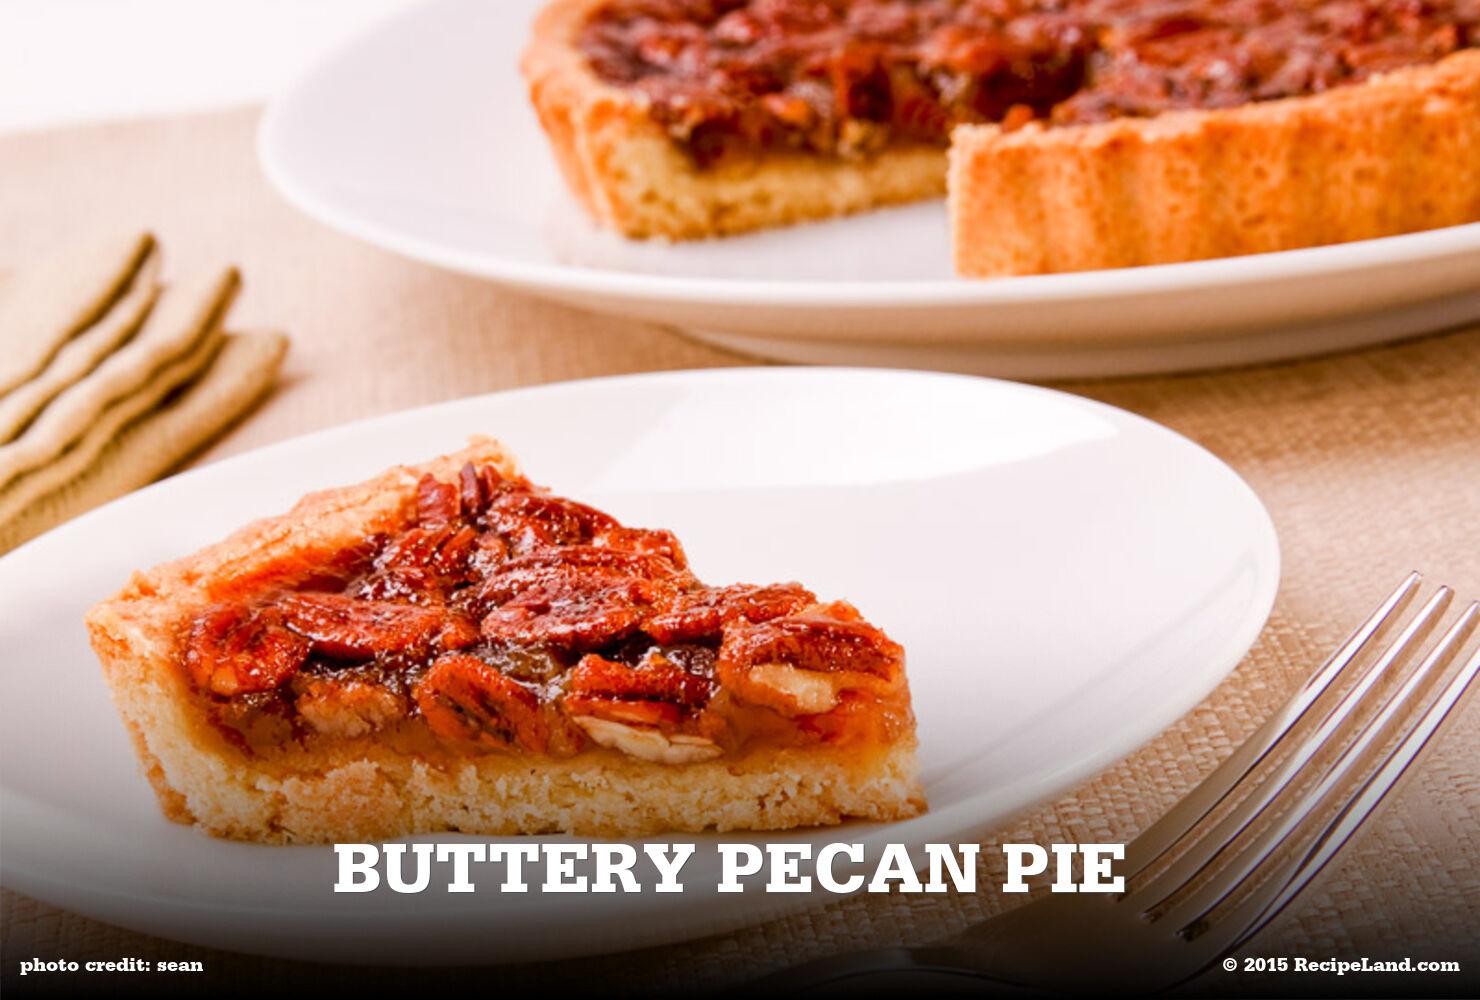 Buttery Pecan Pie